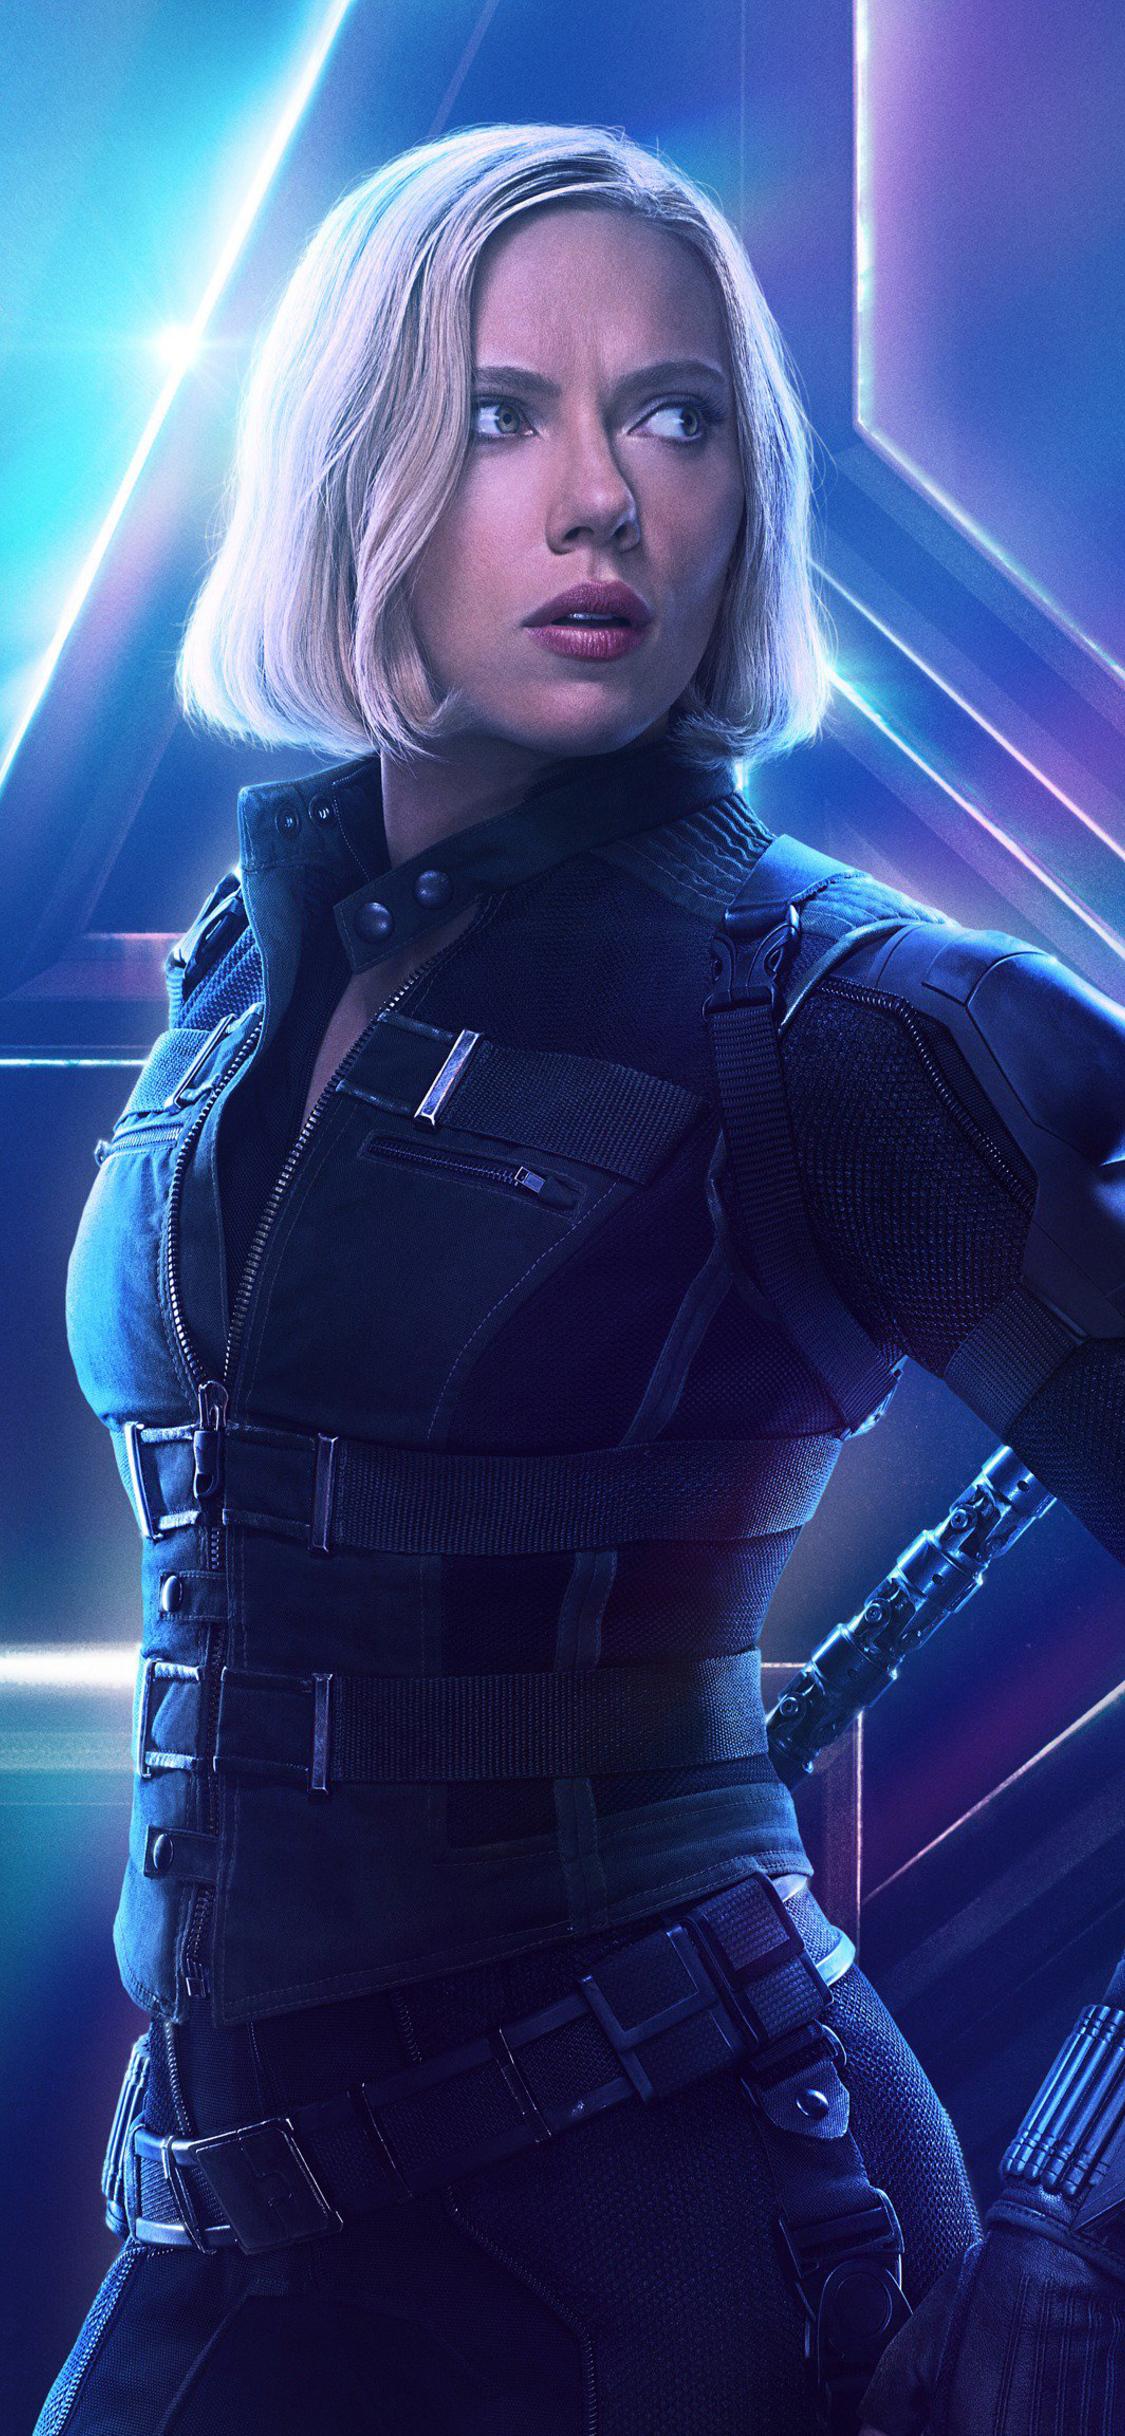 1125x2436 Black Widow In Avengers Infinity War New Poster Iphone XS,Iphone 10,Iphone X HD 4k ...